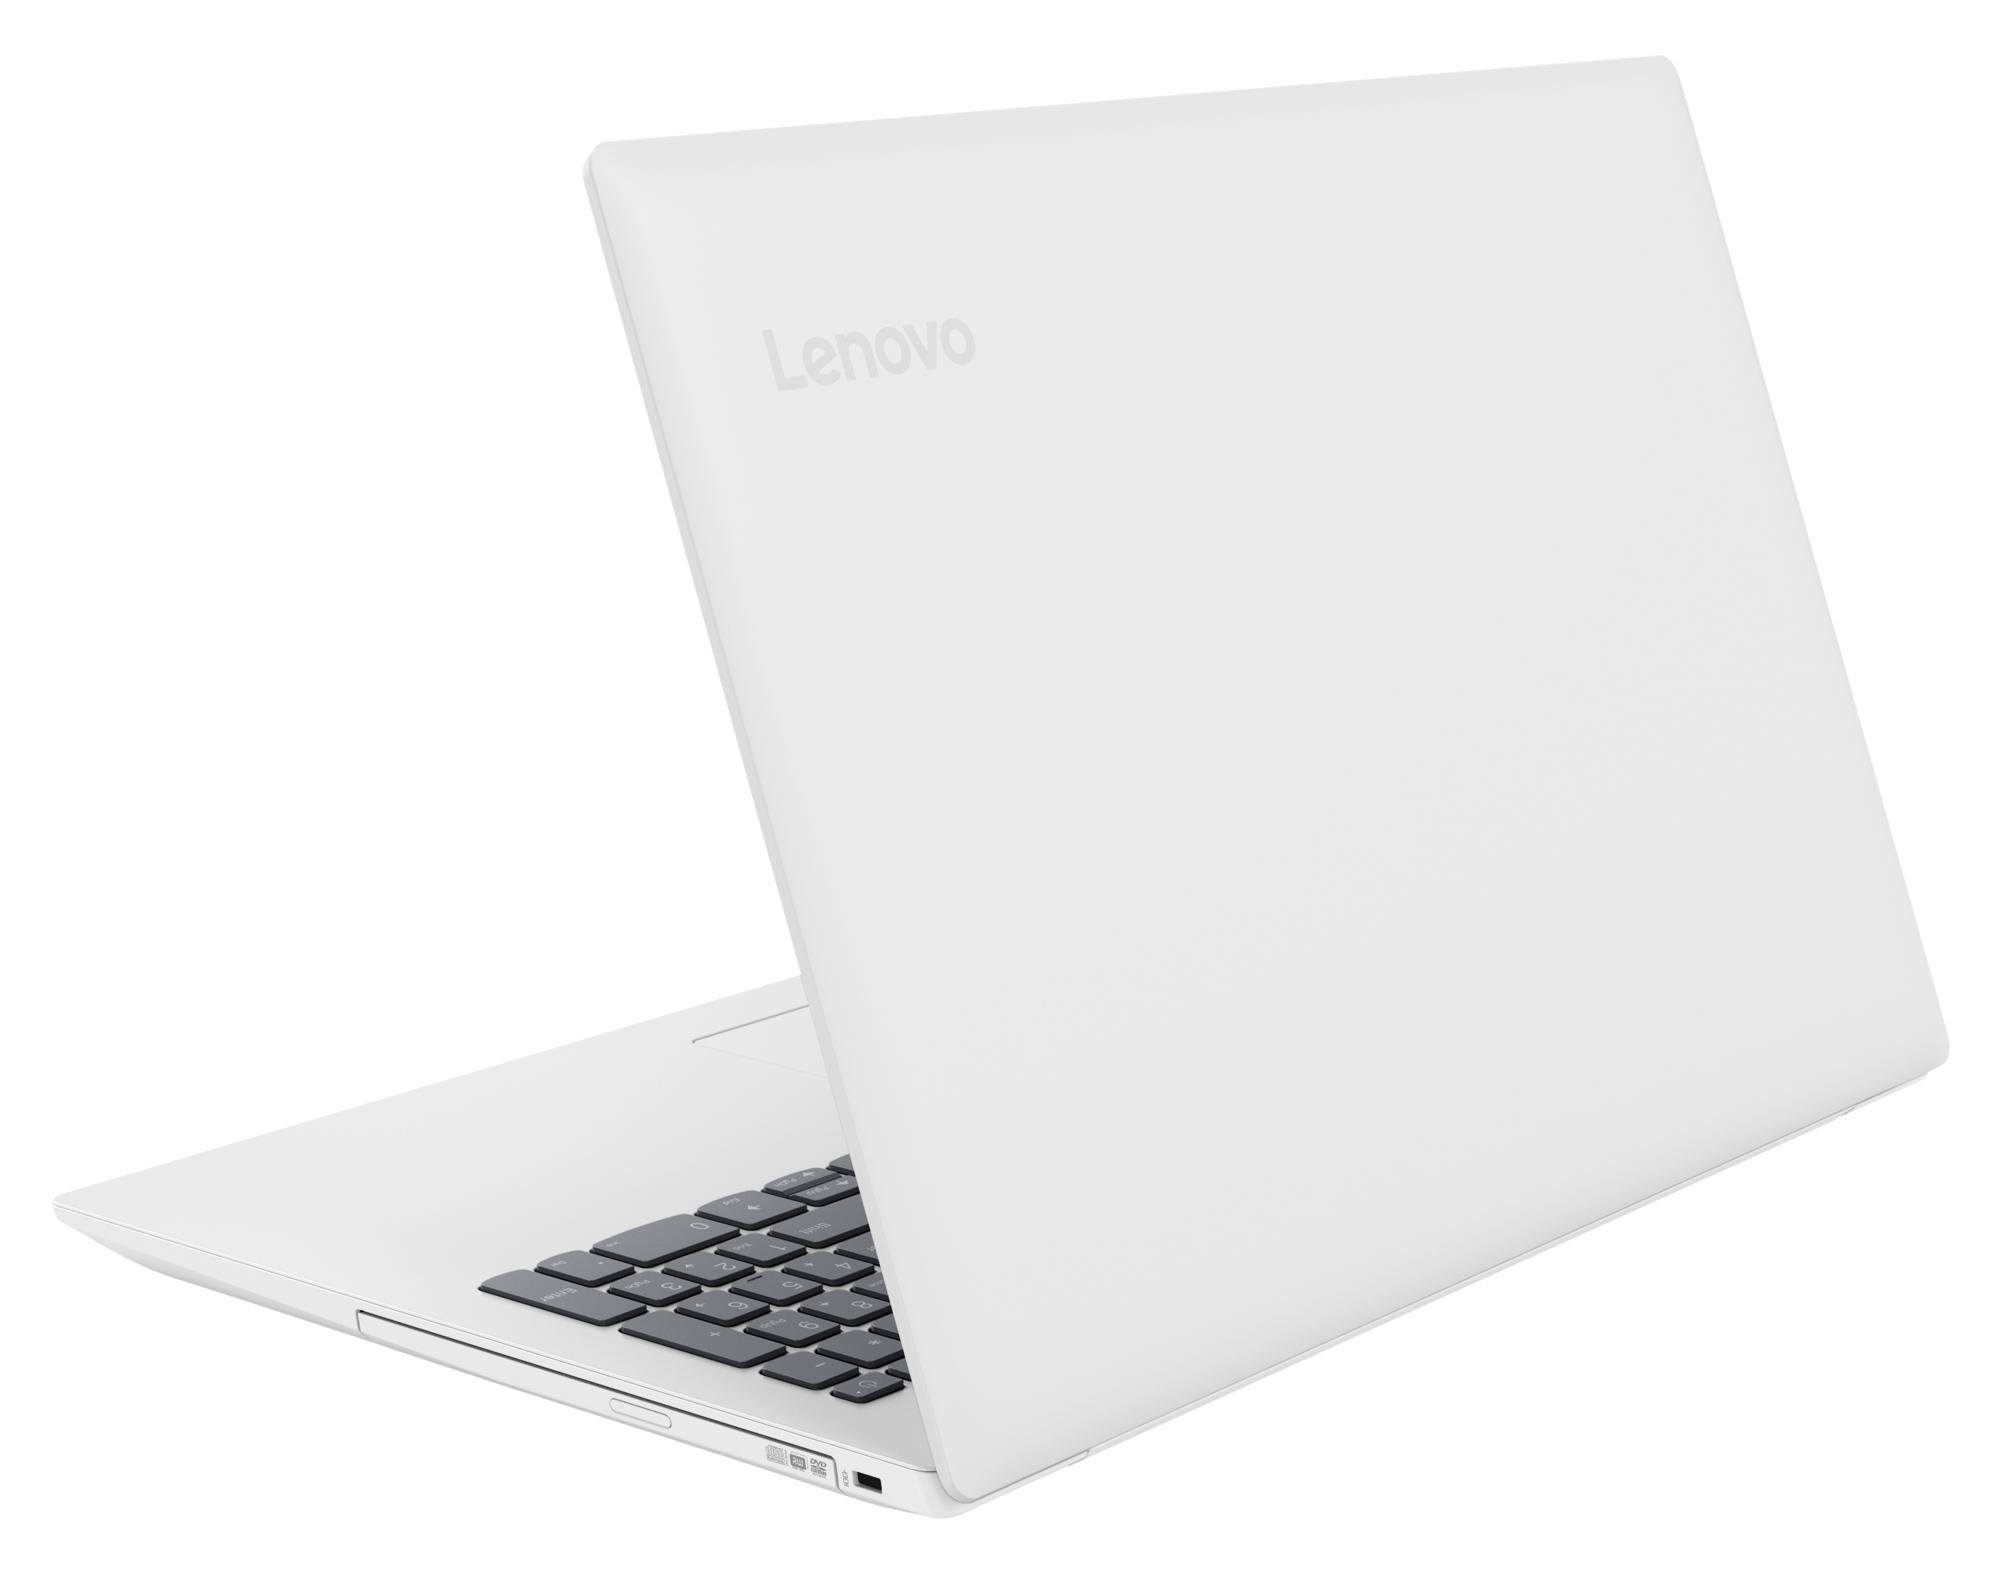 Фото  Ноутбук Lenovo ideapad 330-15 Blizzard White (81DC012FRA)